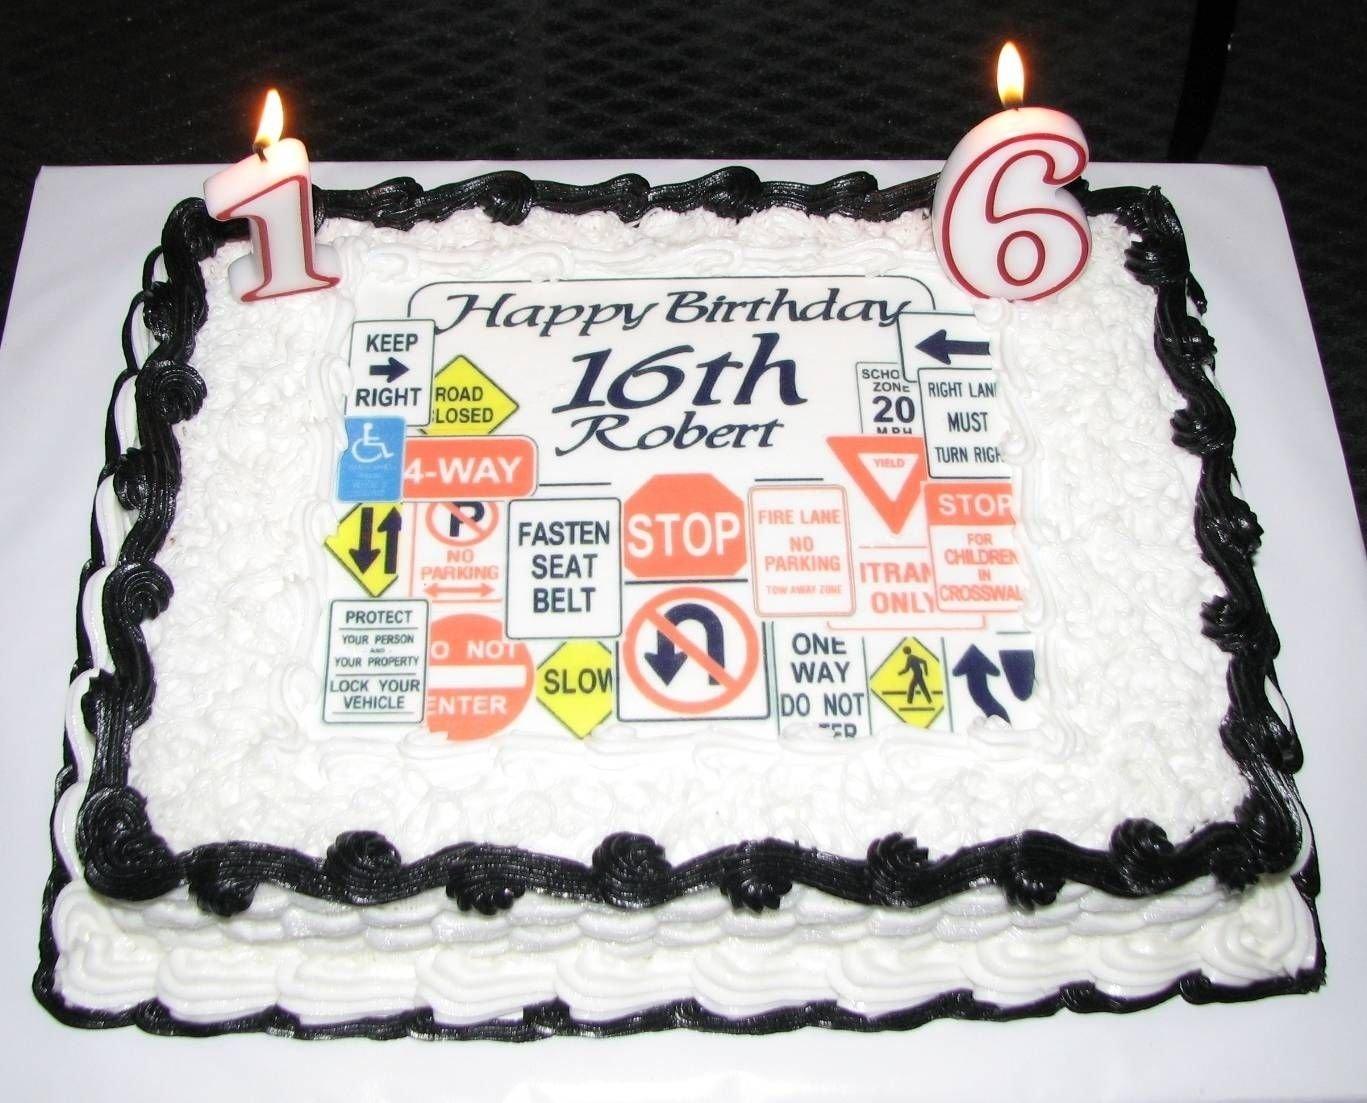 10 Trendy 16Th Birthday Ideas For Boys 16th birthday cake ideas for boys my next projects pinterest 1 2020